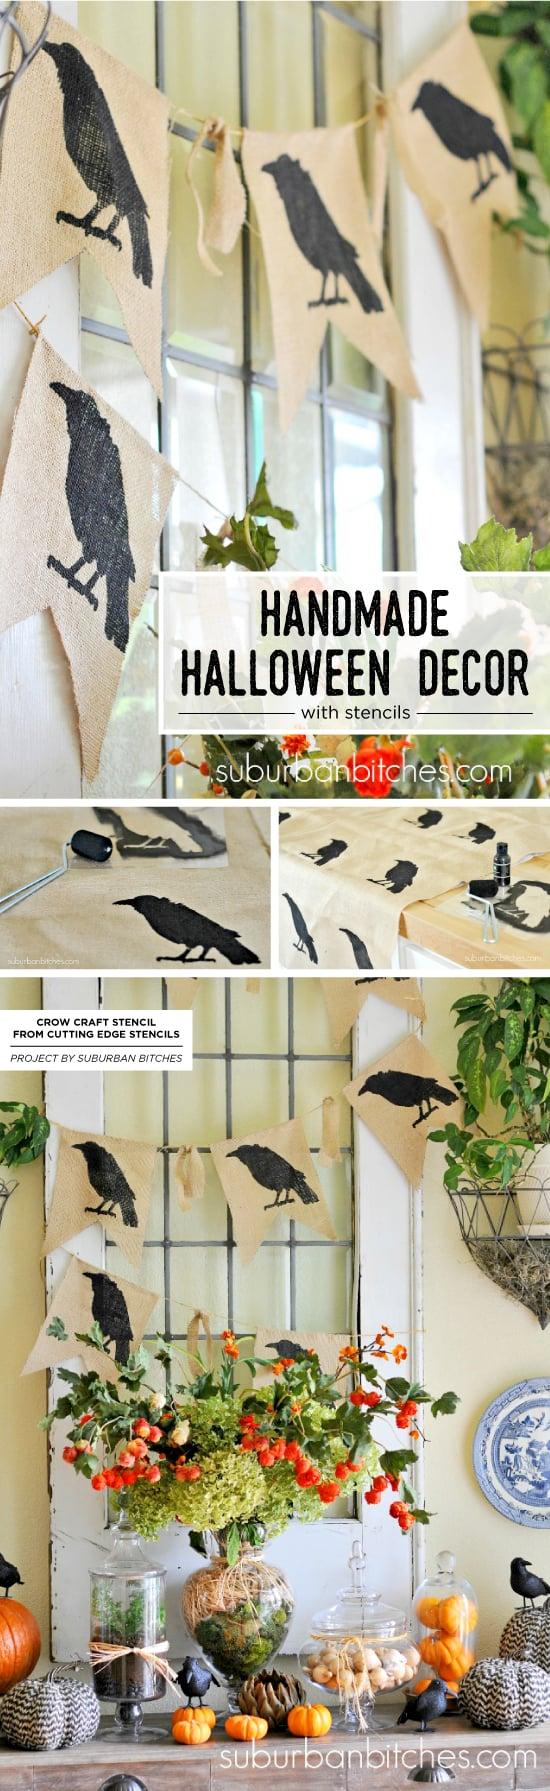 Cutting Edge Stencils shares how to create DIY handmade Halloween decorations using craft stencils. http://www.cuttingedgestencils.com/halloween-stencils-crow-stencil-design-diy-craft.html